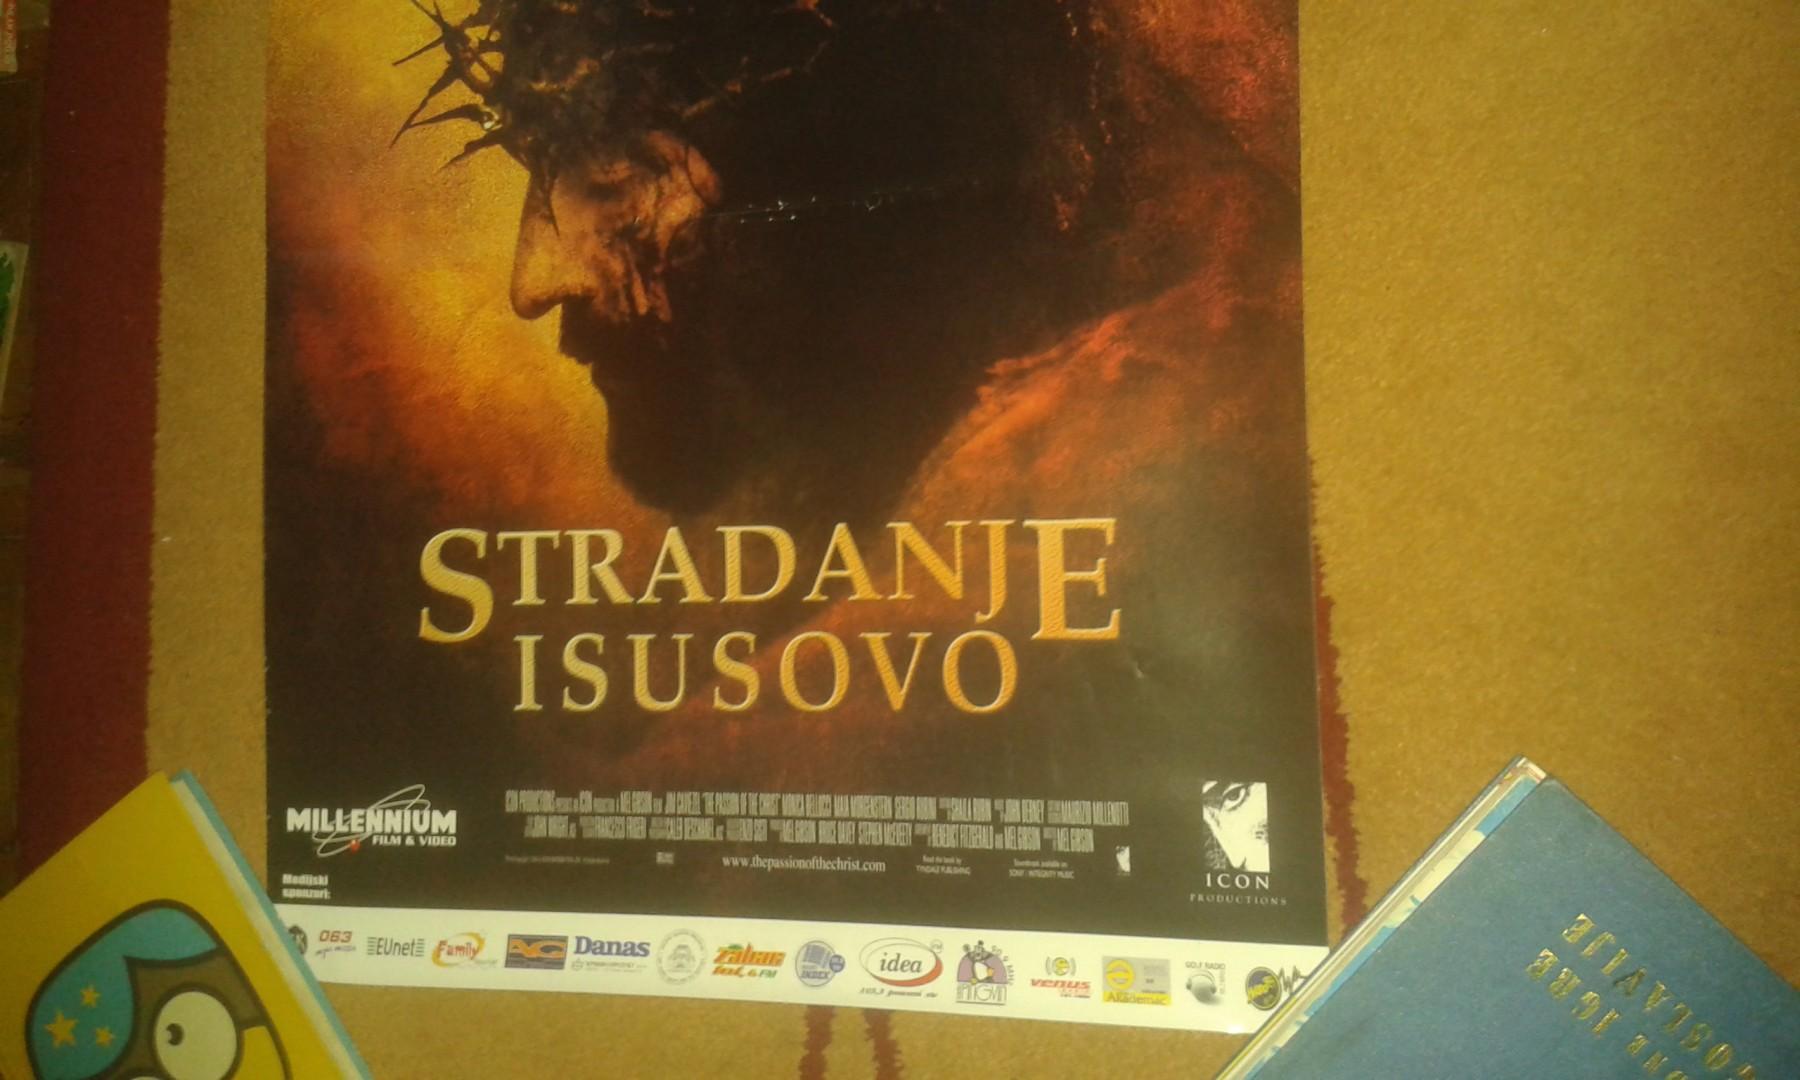 Filmski plakati - Page 28 Originalslika_Filmski-Plakat-Stradanje-Isusovo-Mel-Gibson-168356997